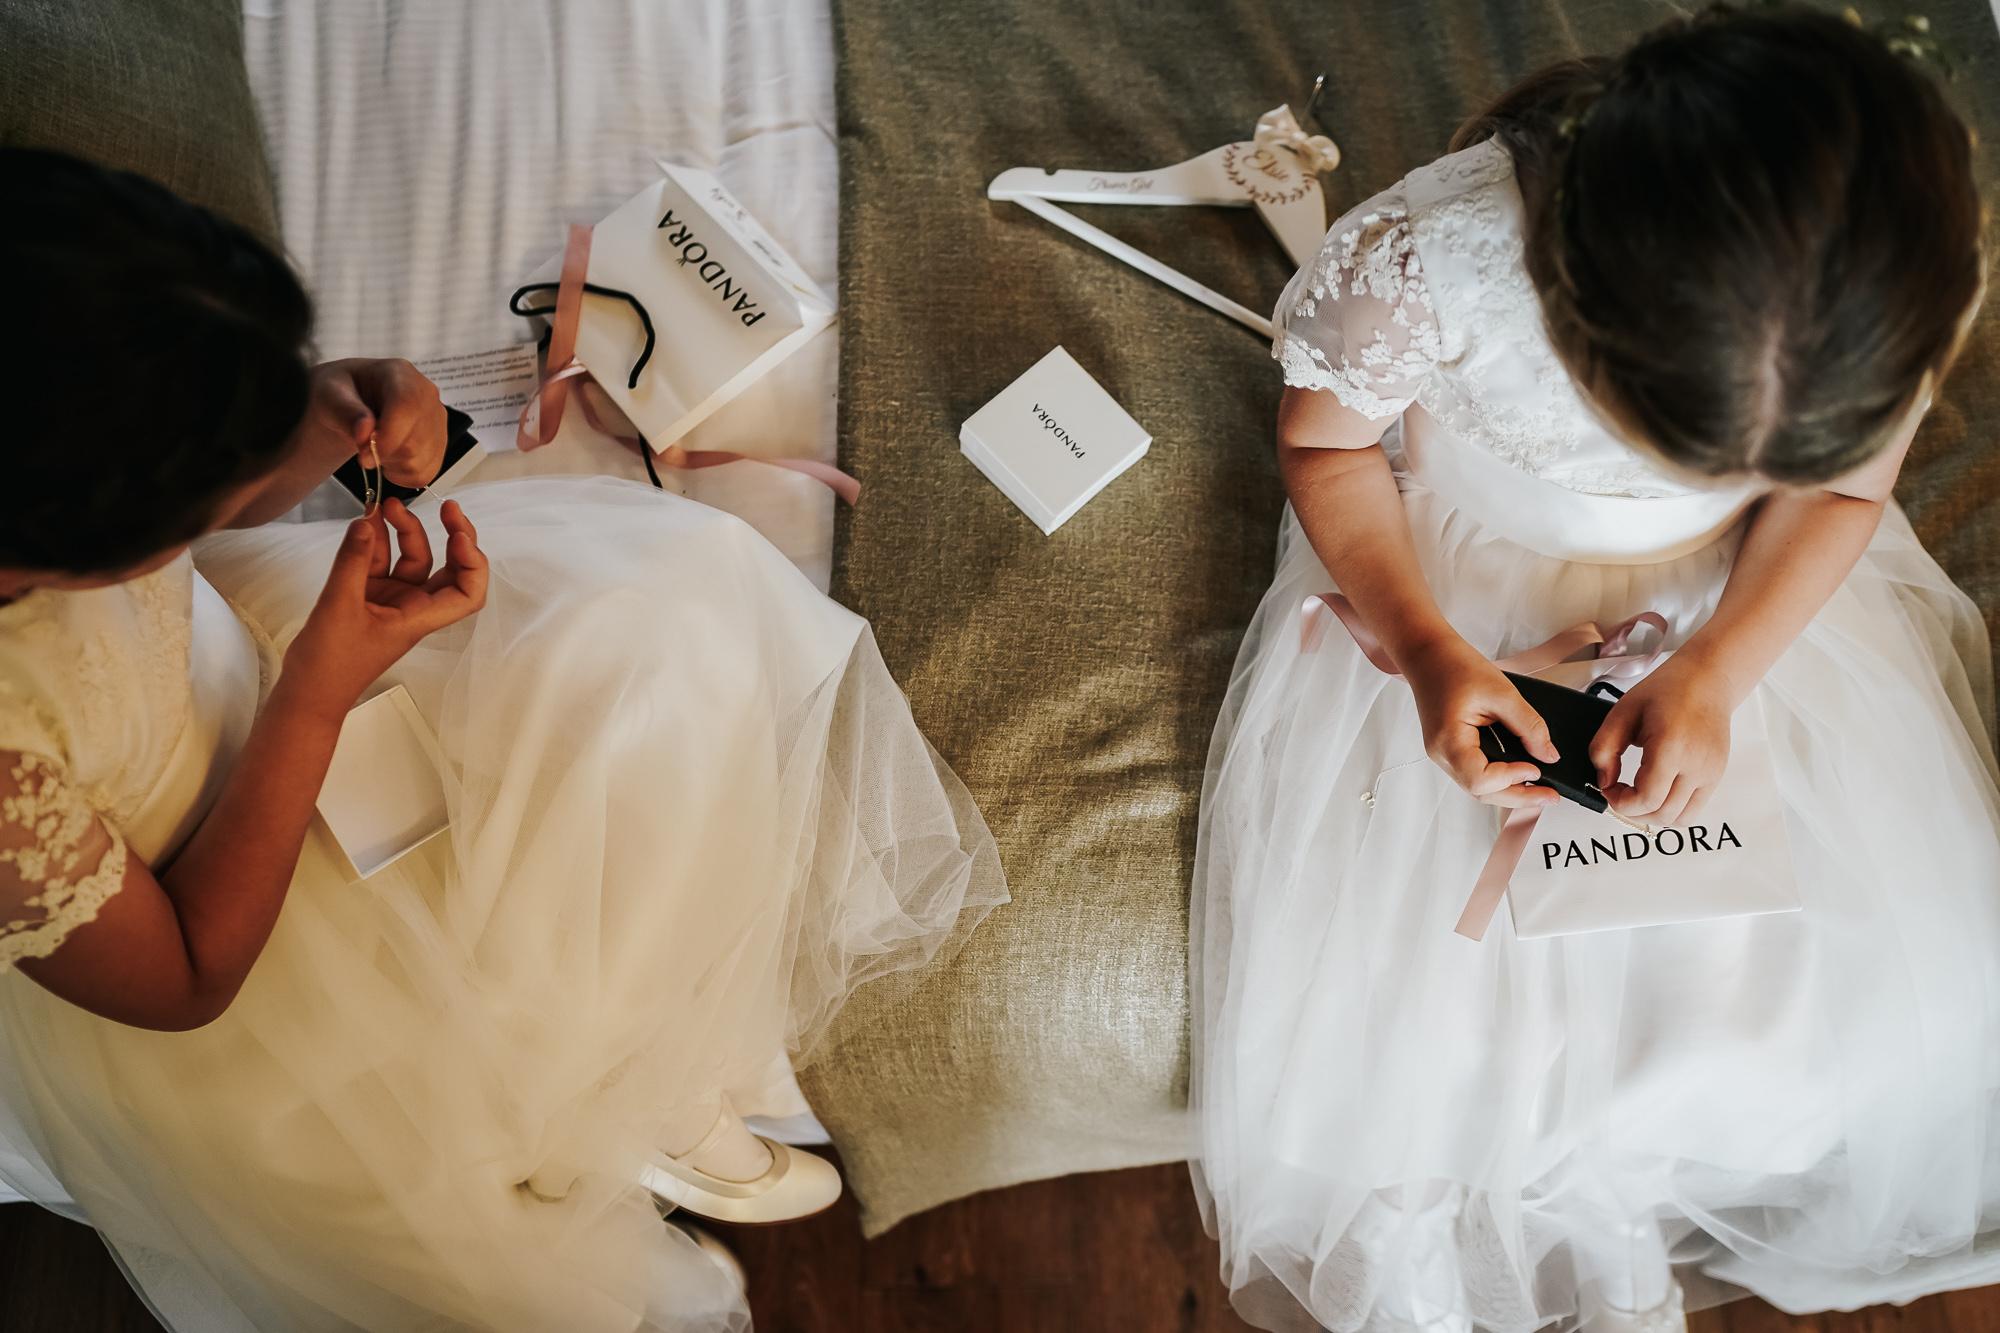 West Tower Wedding Photographer Ormskirk Lancashire wedding photography (16 of 57).jpg